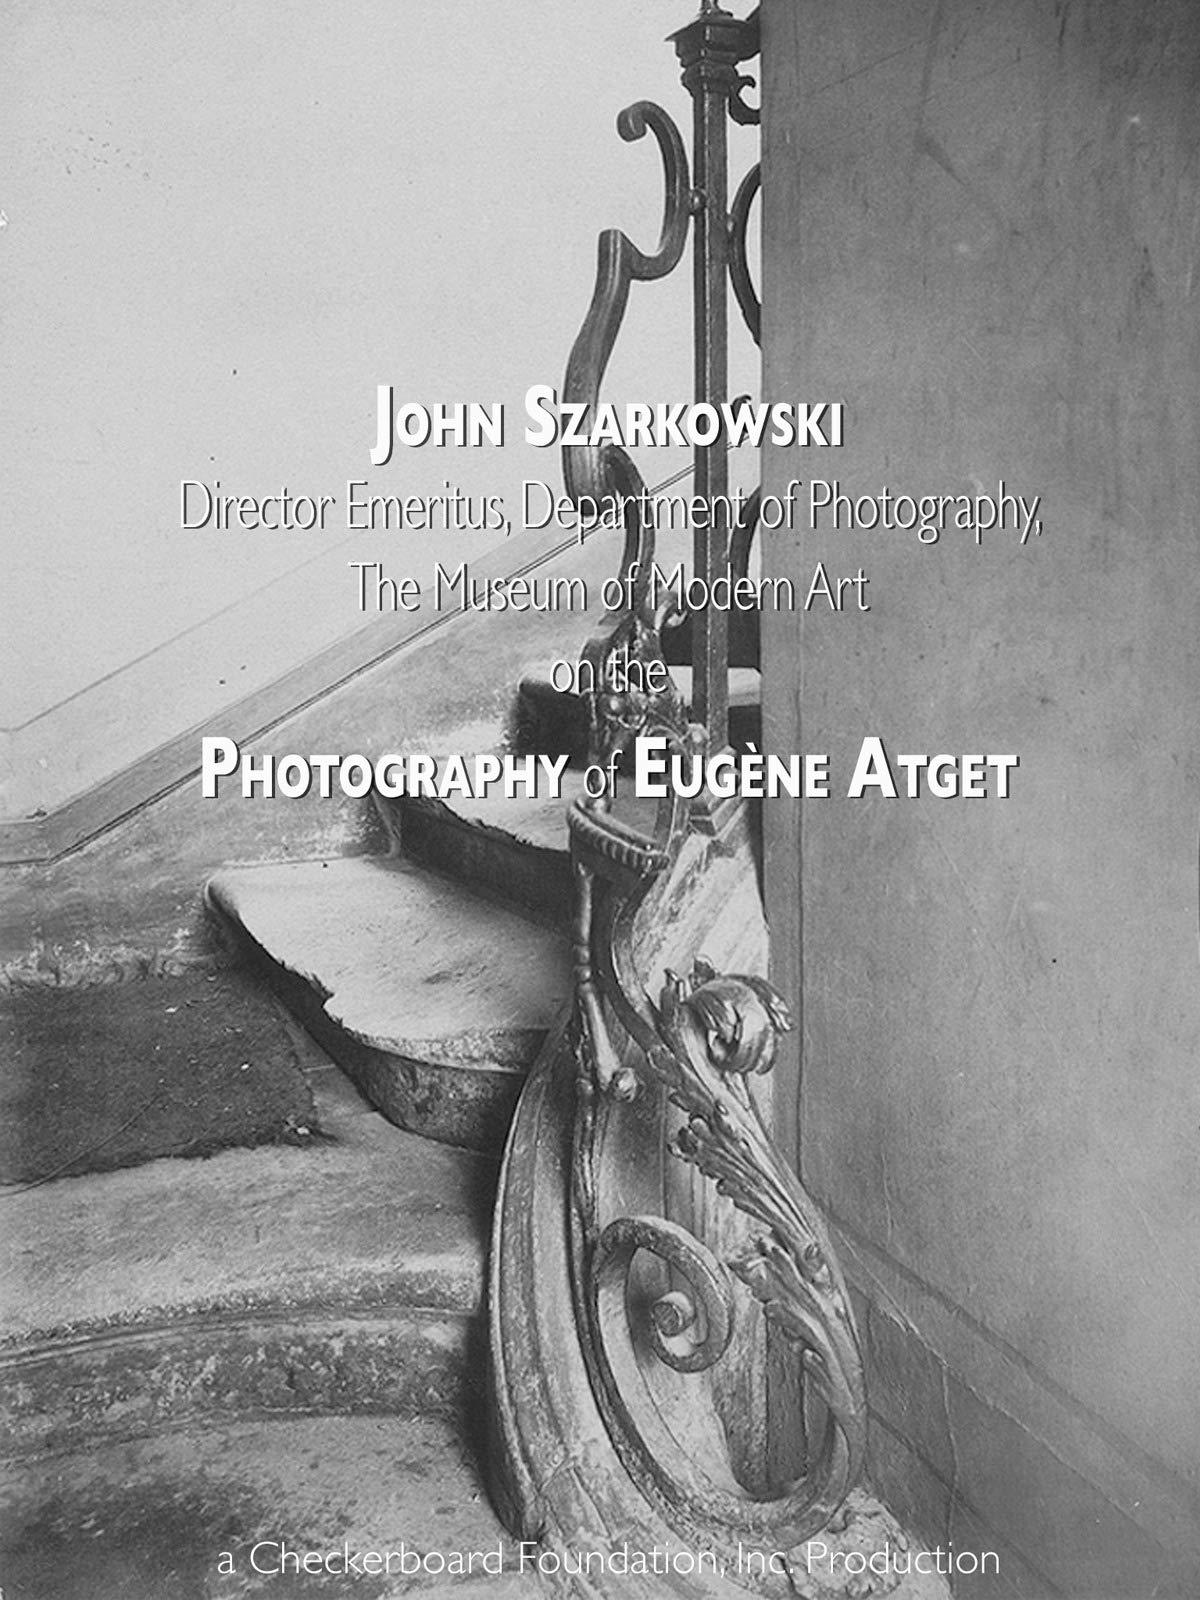 John Szarkowski on Eugene Atget